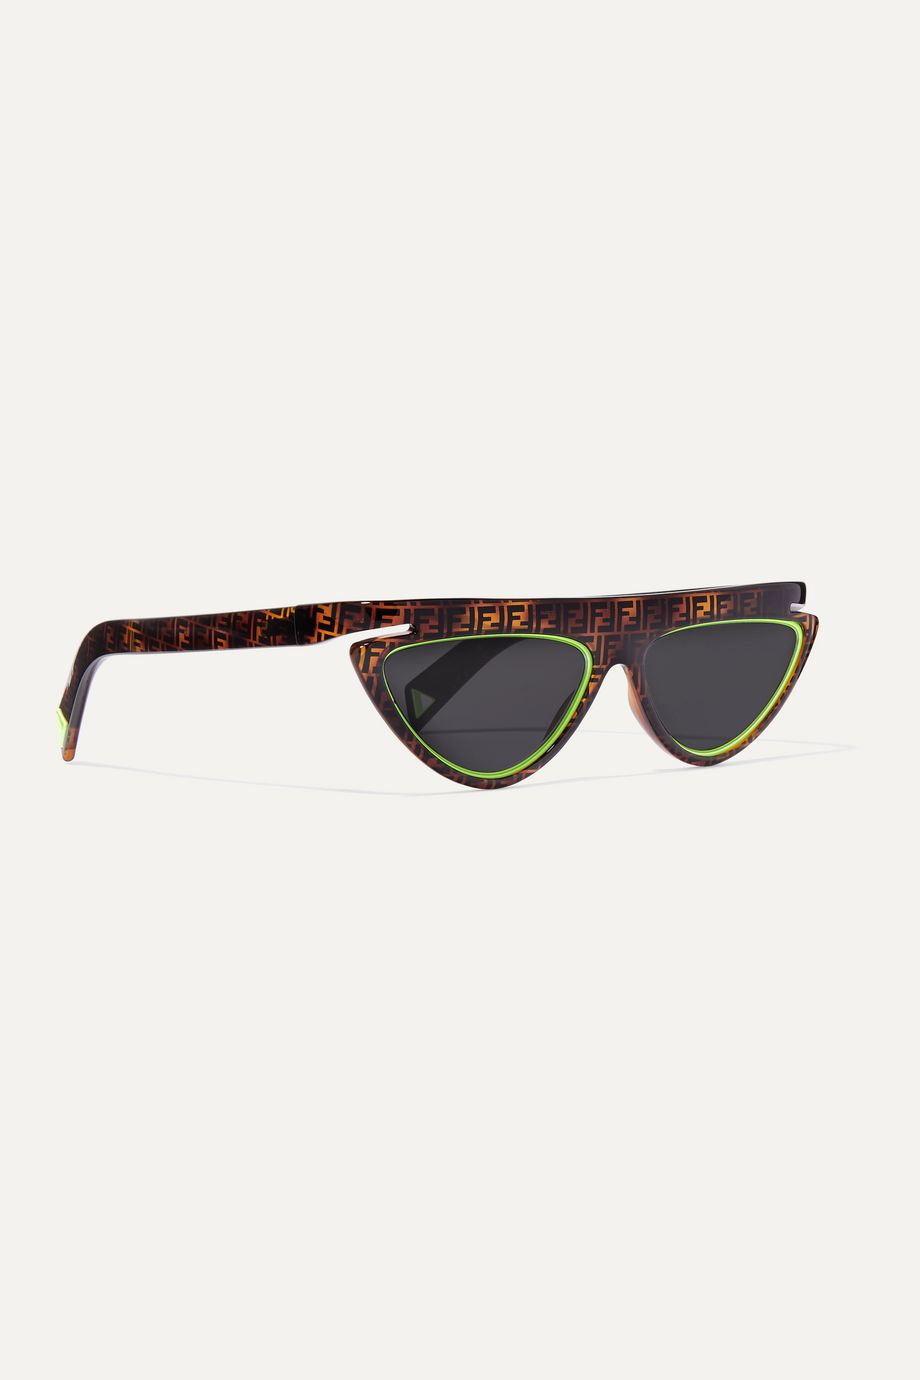 Fendi Cat-eye neon-trimmed printed tortoisehell acetate sunglasses